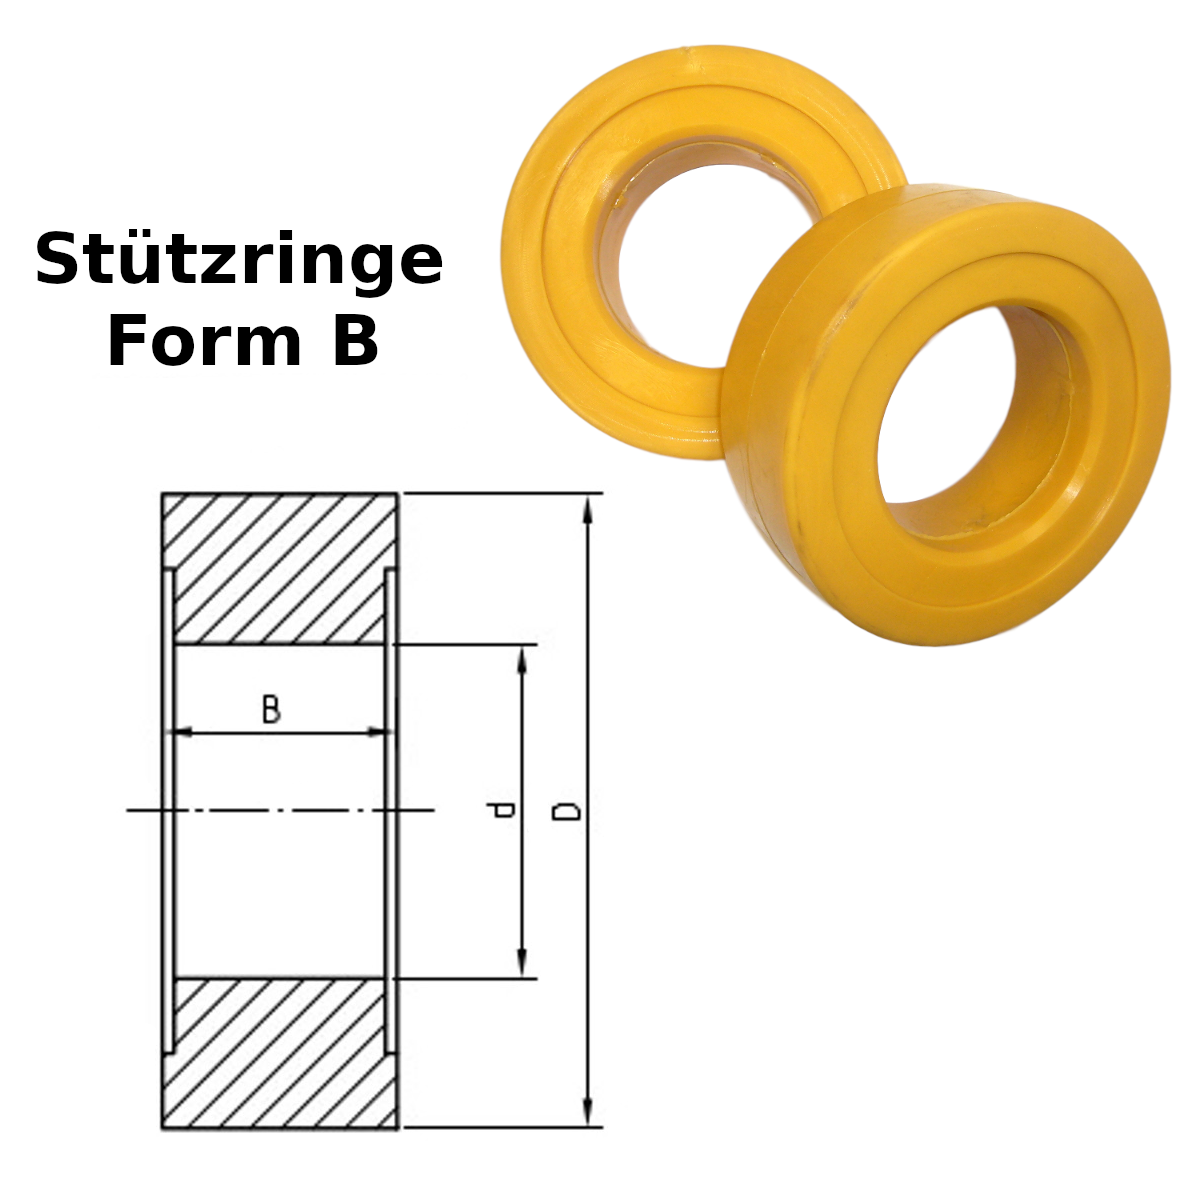 Stützringe Form B